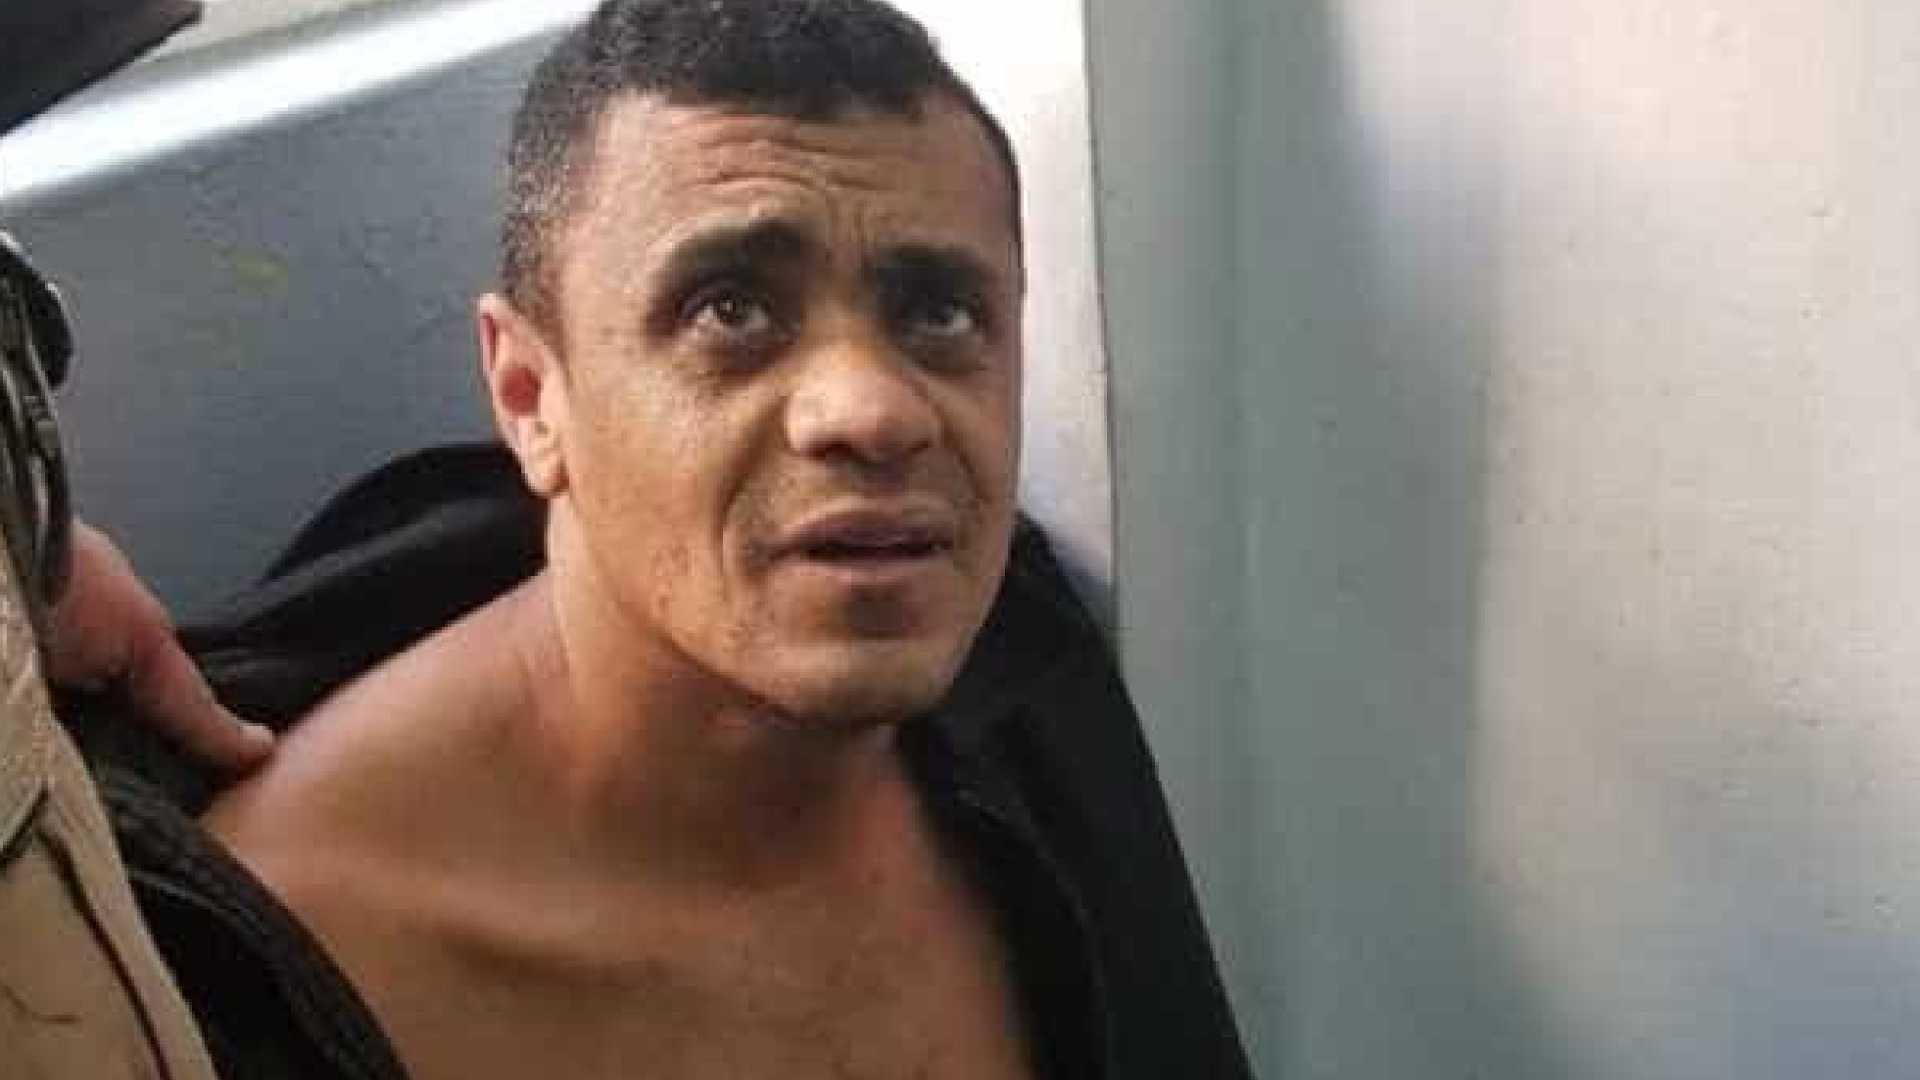 adelio atentado bolsonaro operação advogado radio corredor - PF investiga se PCC financiou algoz de Bolsonaro